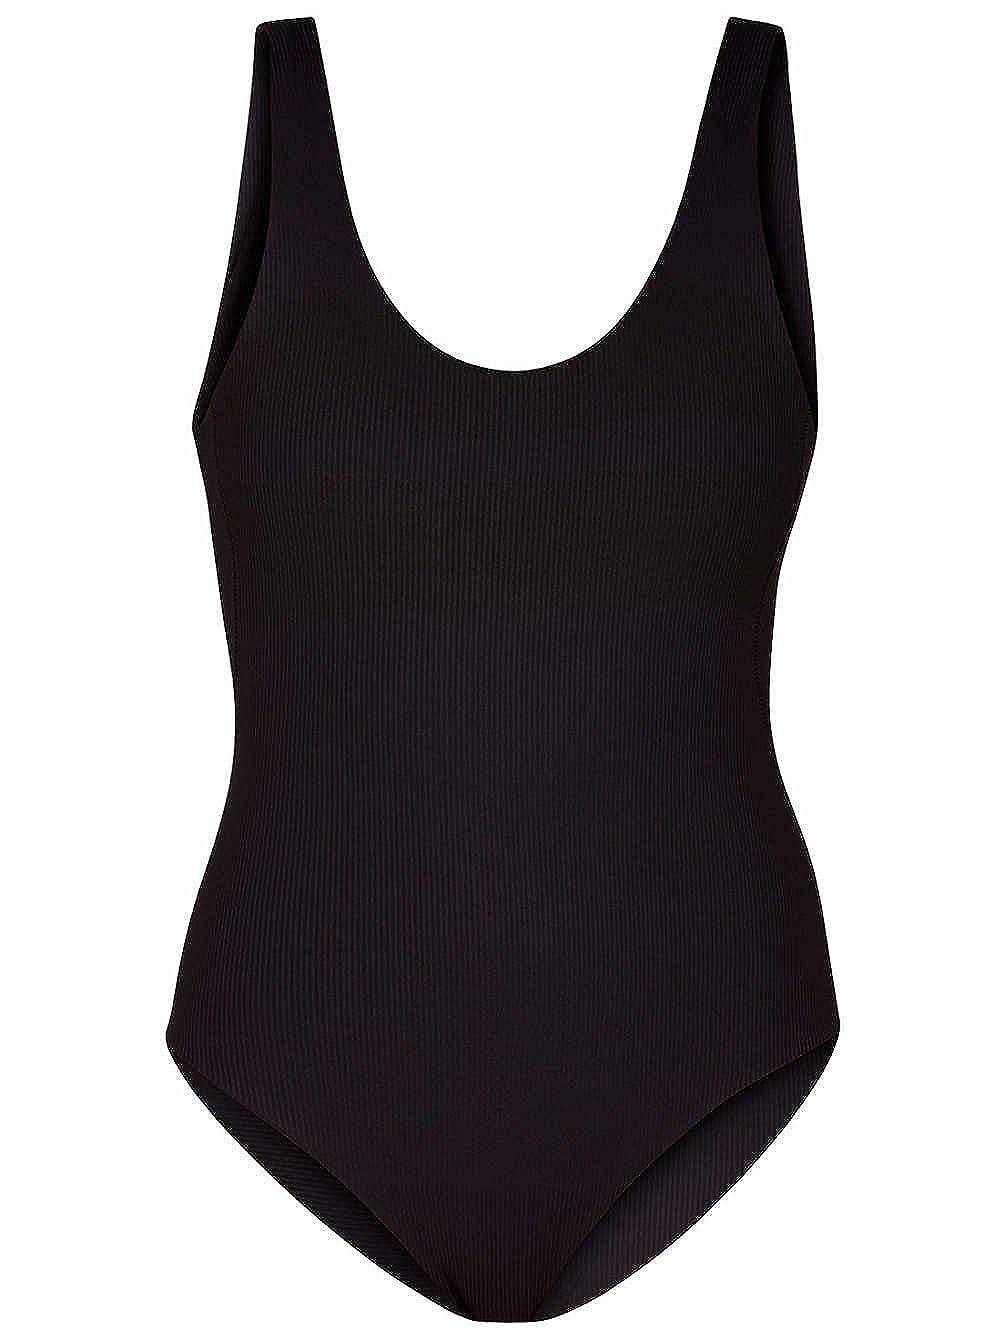 9d623edf7c Hurley Women s Quick Dry Block Party Hybrid Swimsuit Bodysuit at Amazon Women s  Clothing store